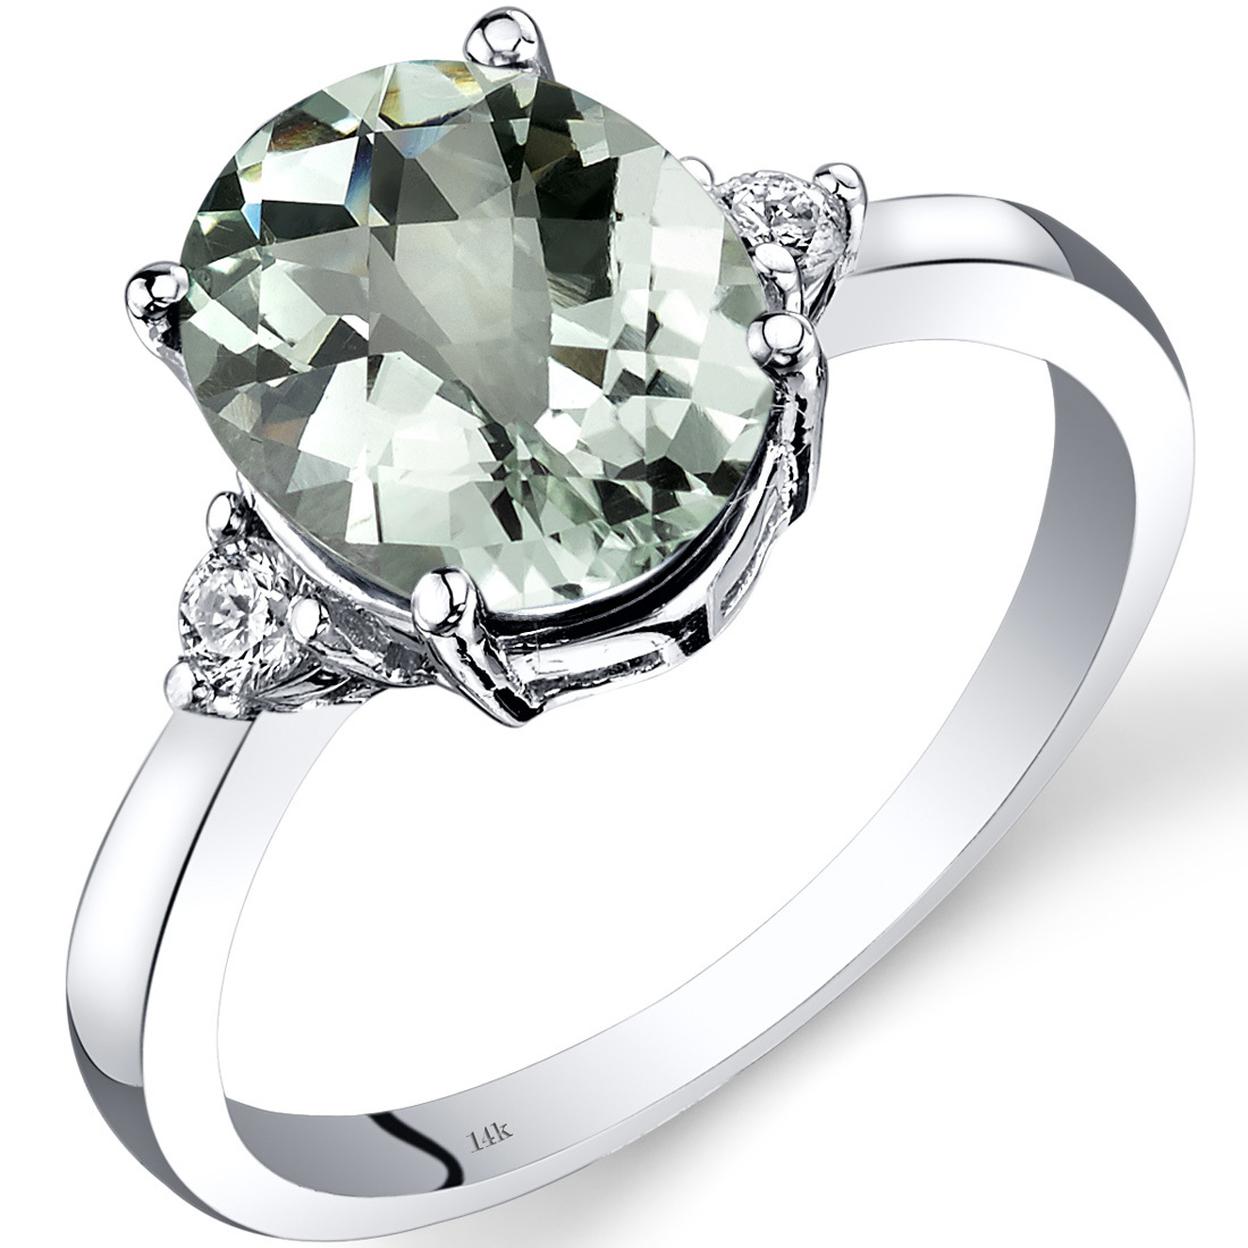 14k White Gold Green Amethyst Diamond Ring 2.25 Carat Oval Cut R62166